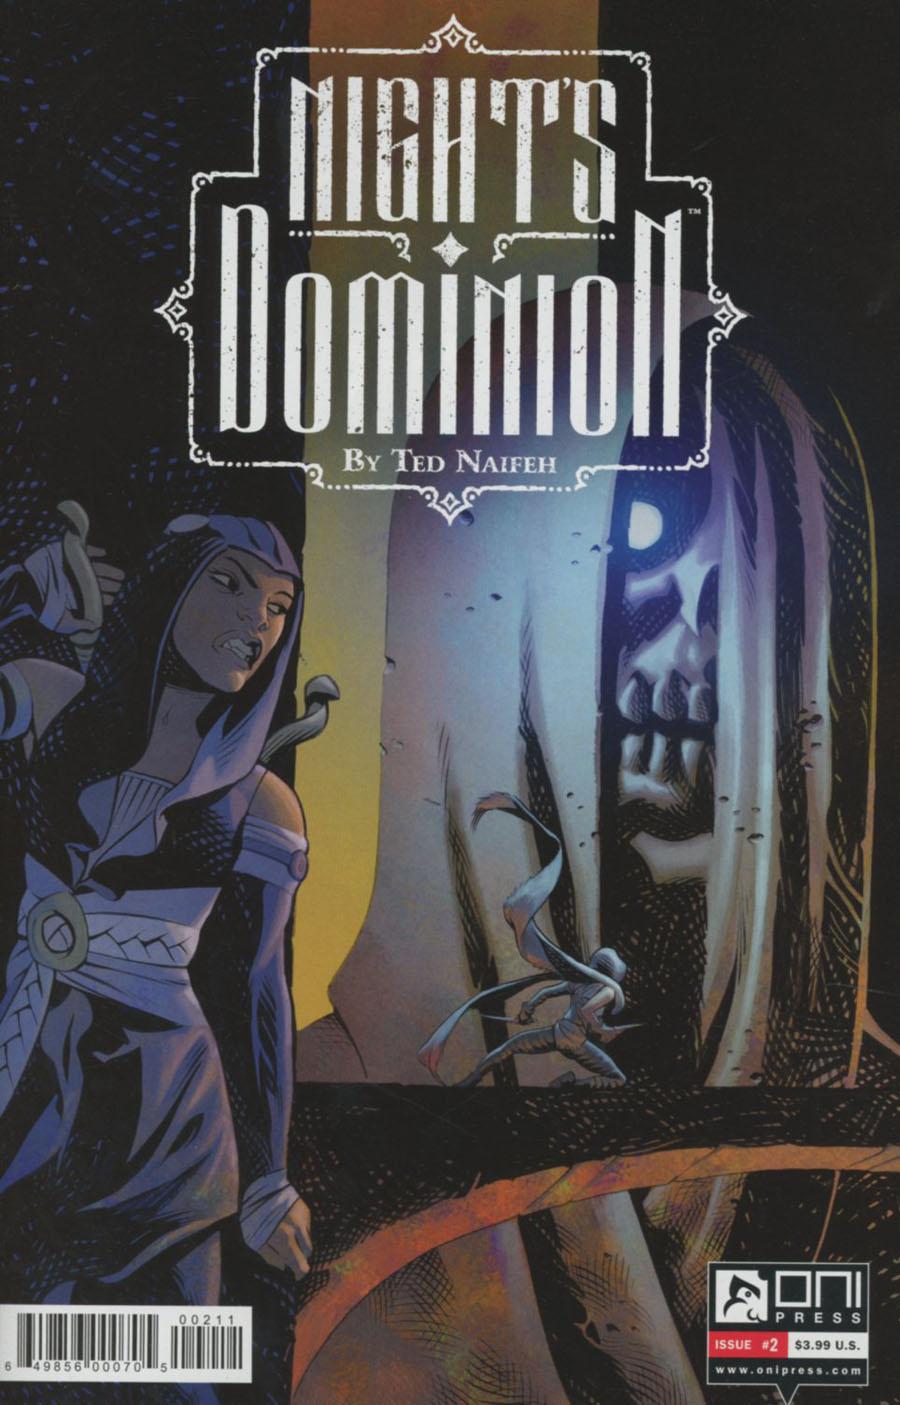 Nights Dominion #2